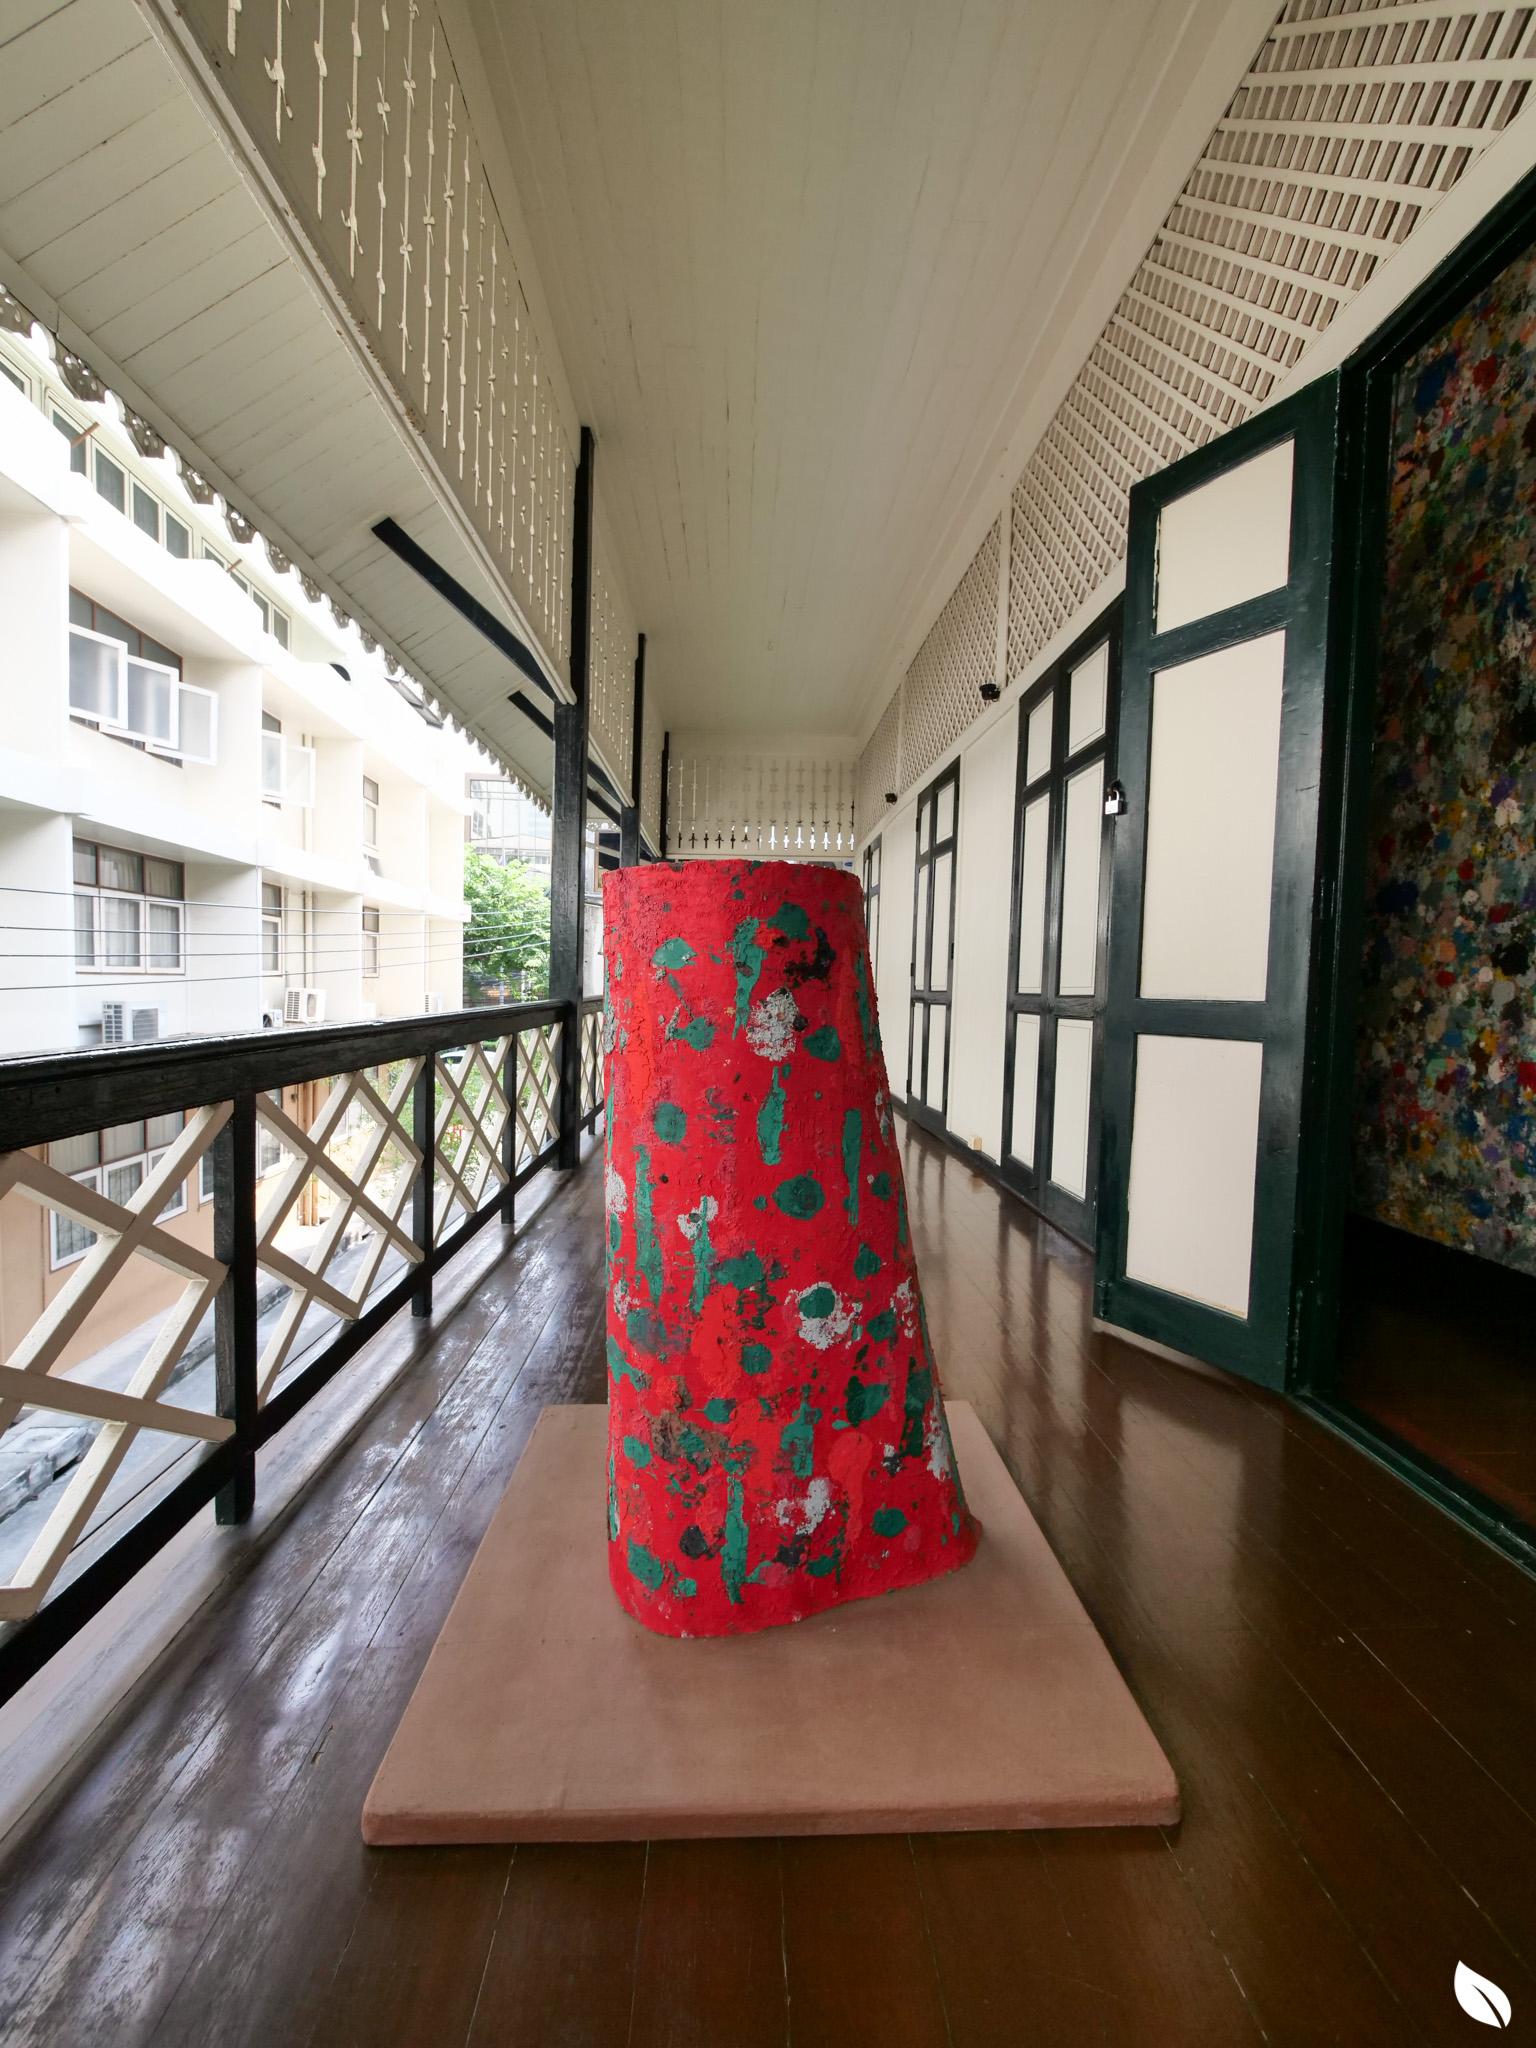 ANIL Sathorn 12 คอนโดสาทรสุดหรูที่ยกระดับคุณภาพชีวิตของผู้พักอาศัย ด้วยมาตรฐาน WELL Building Standard 103 - GRAND UNITY